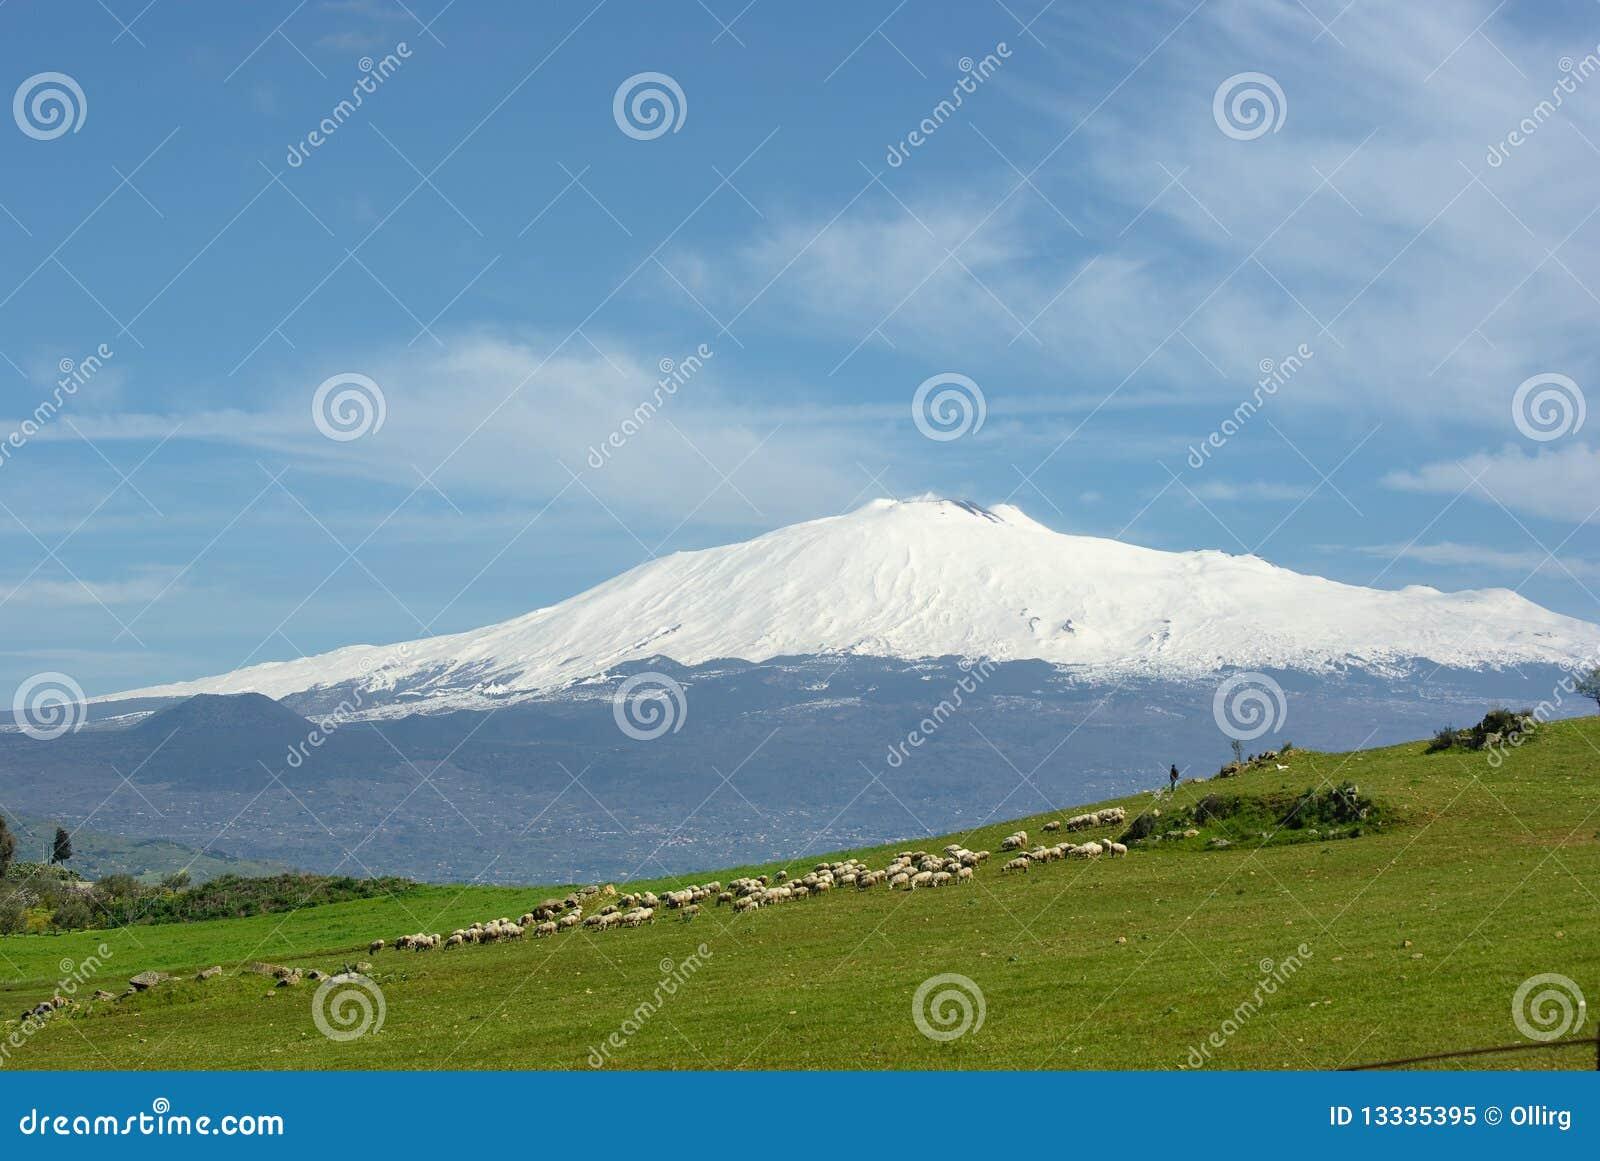 Tła Etna tabunowy wulkan